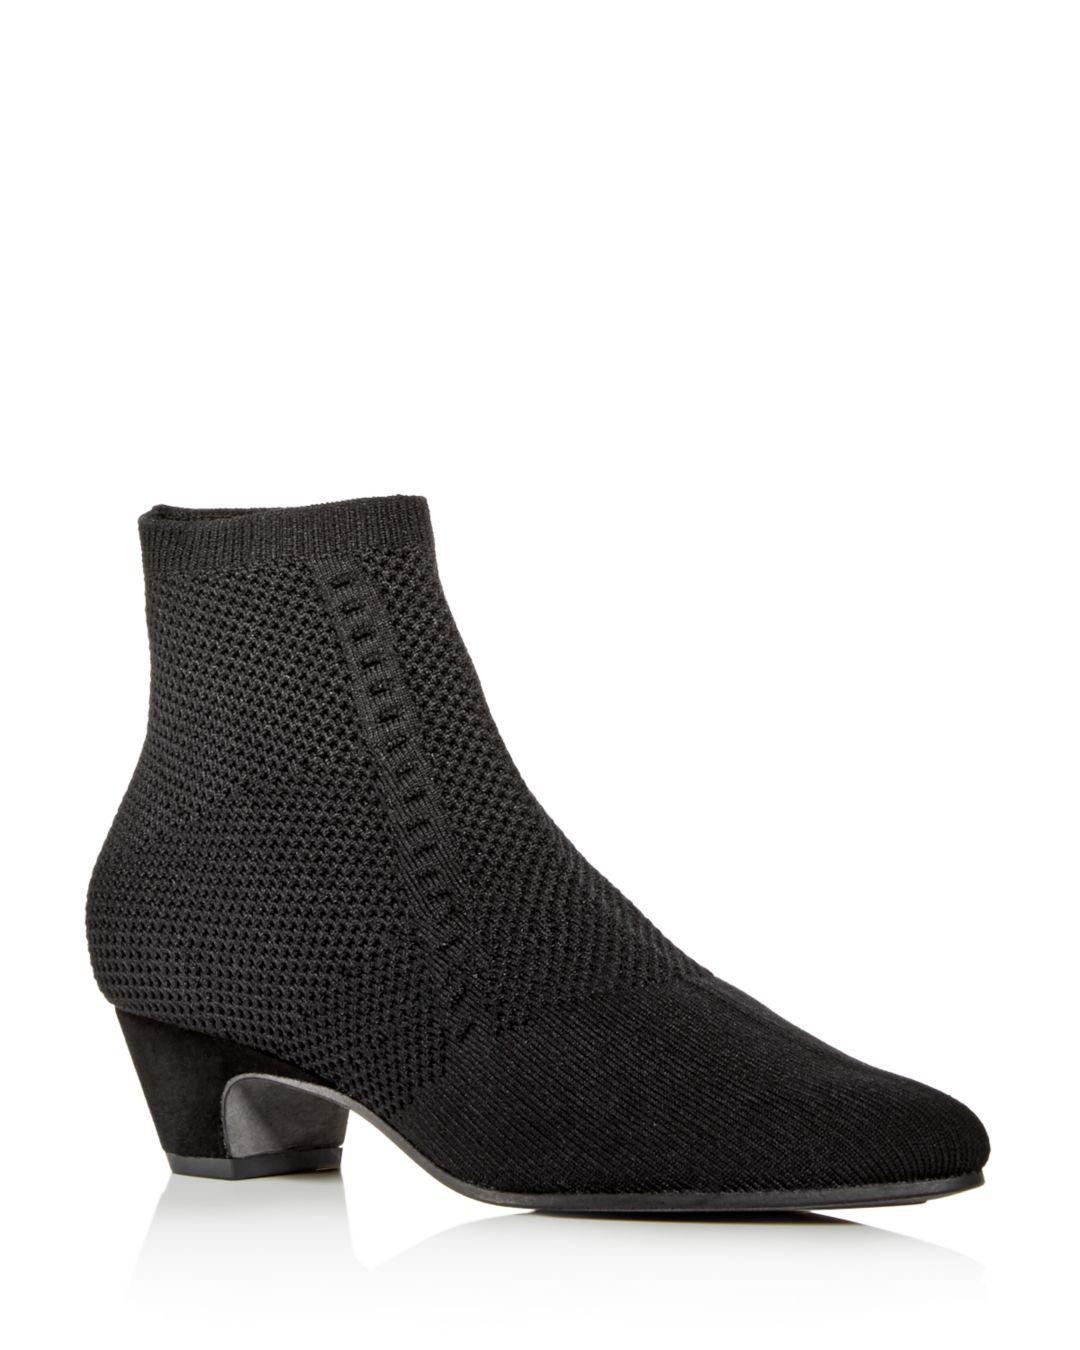 a7a0e9c0465e Eileen Fisher Women s Purl Knit Low-heel Booties in Black - Lyst